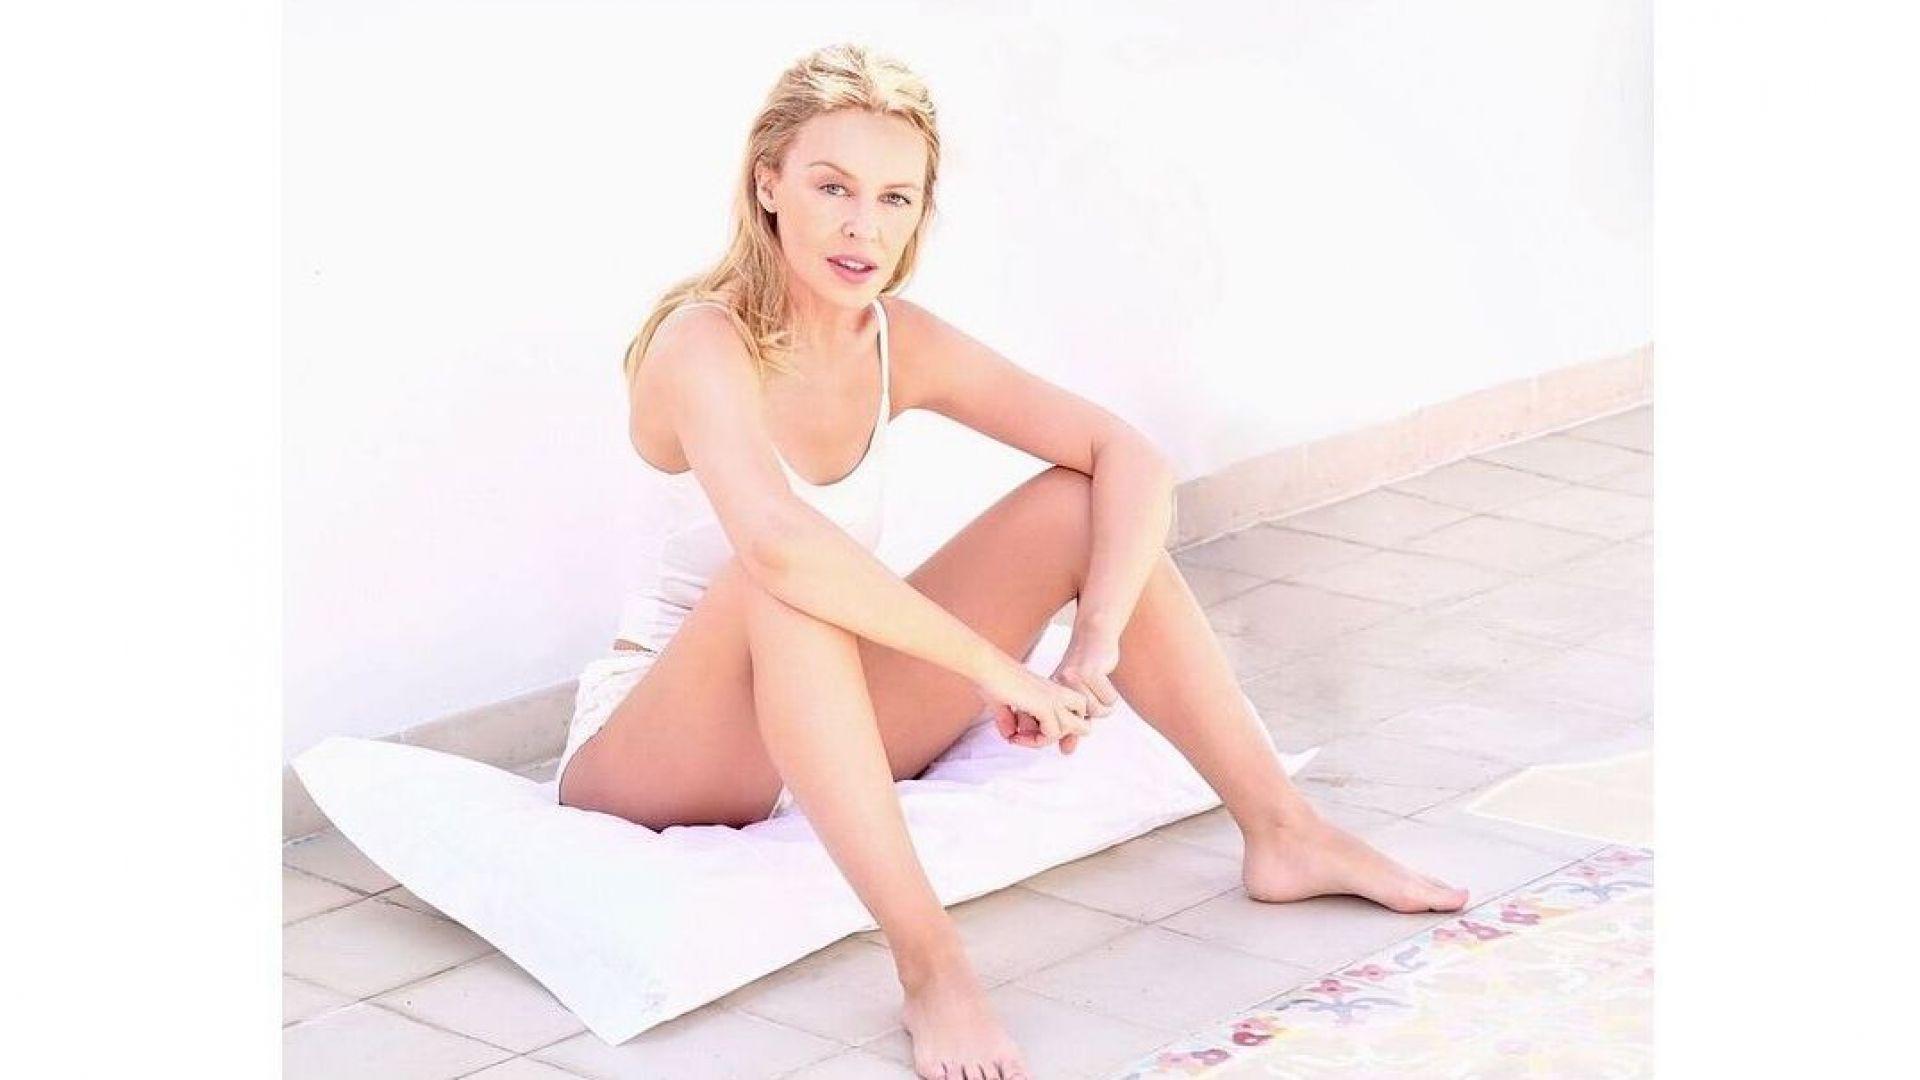 50-годишната Кайли се снима по бельо и без грим